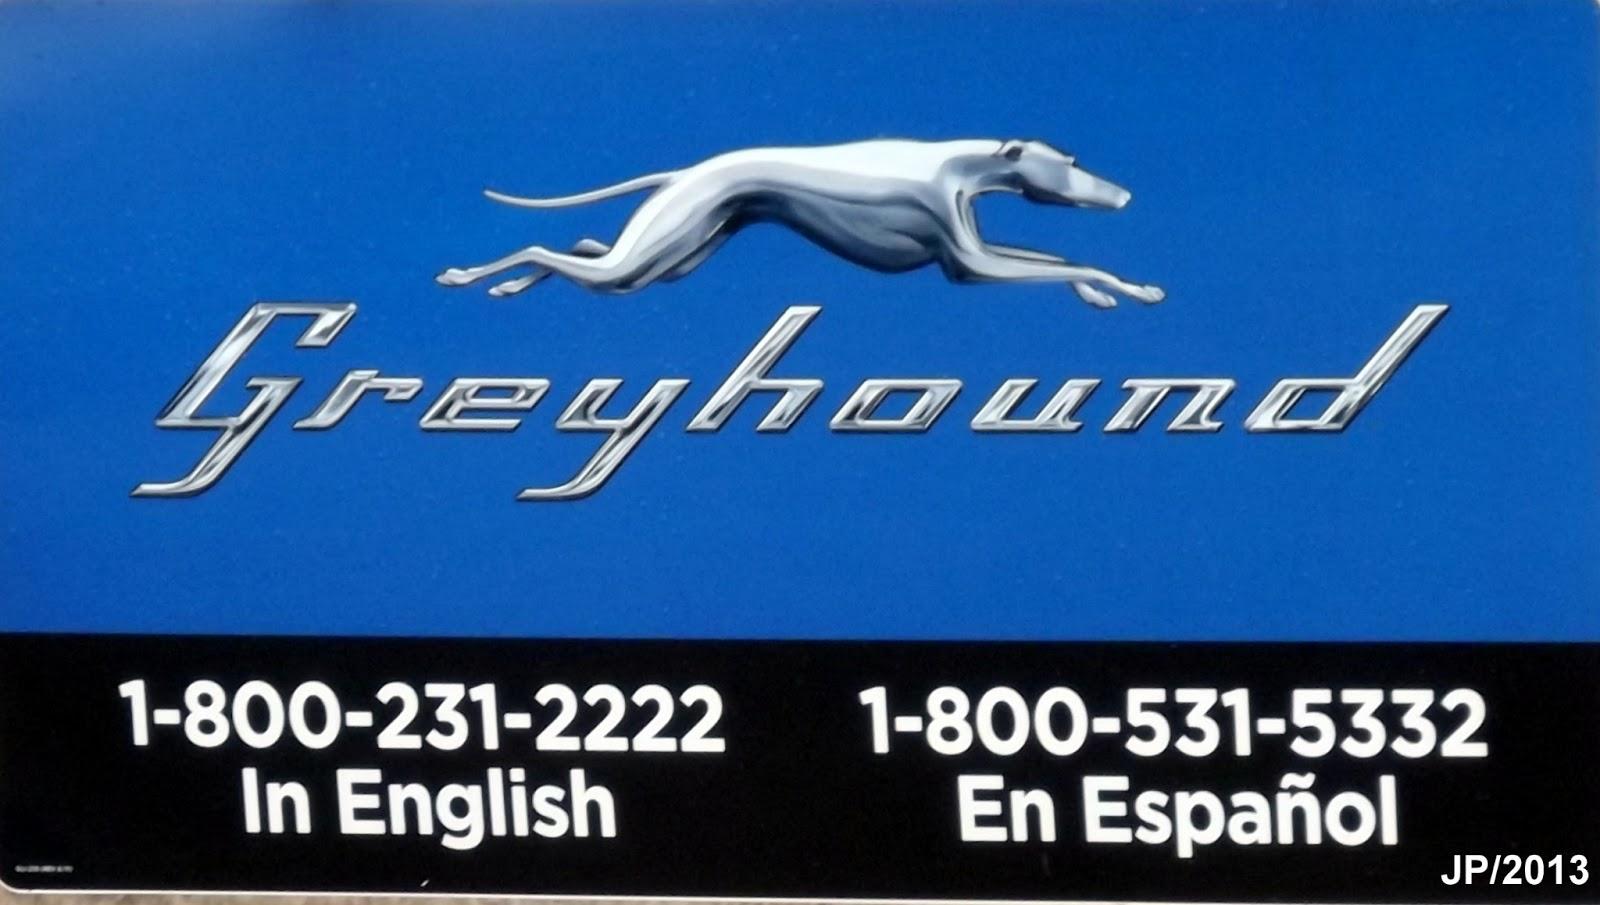 Greyhound 800 Phone Number GREYHOUND Athens Georgia Bus